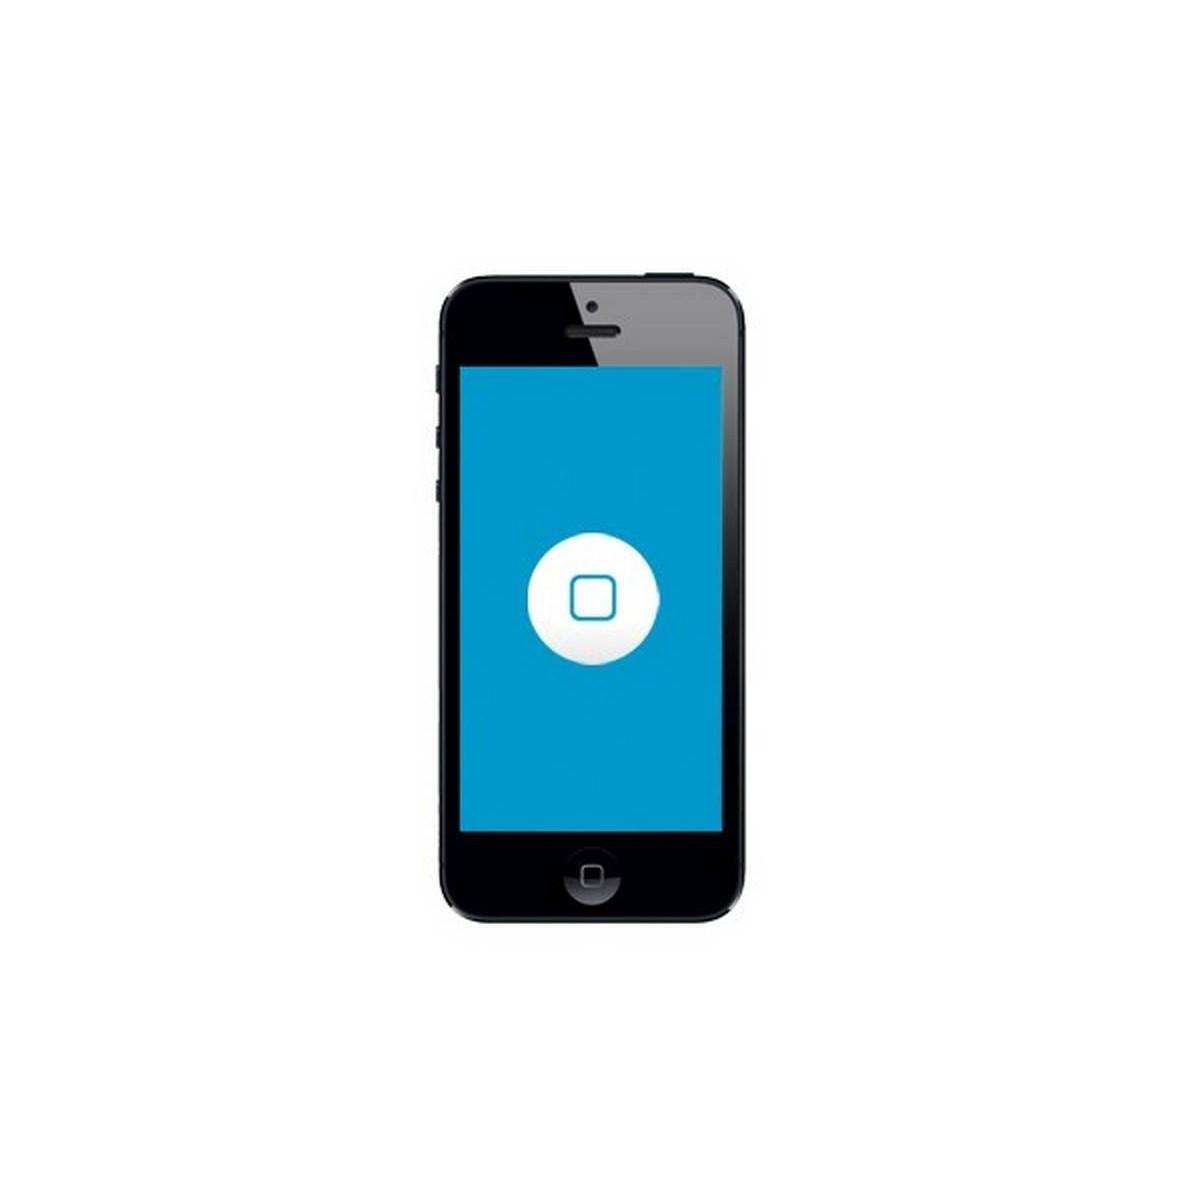 sustituion botão Home iPhone 5 5s 5c